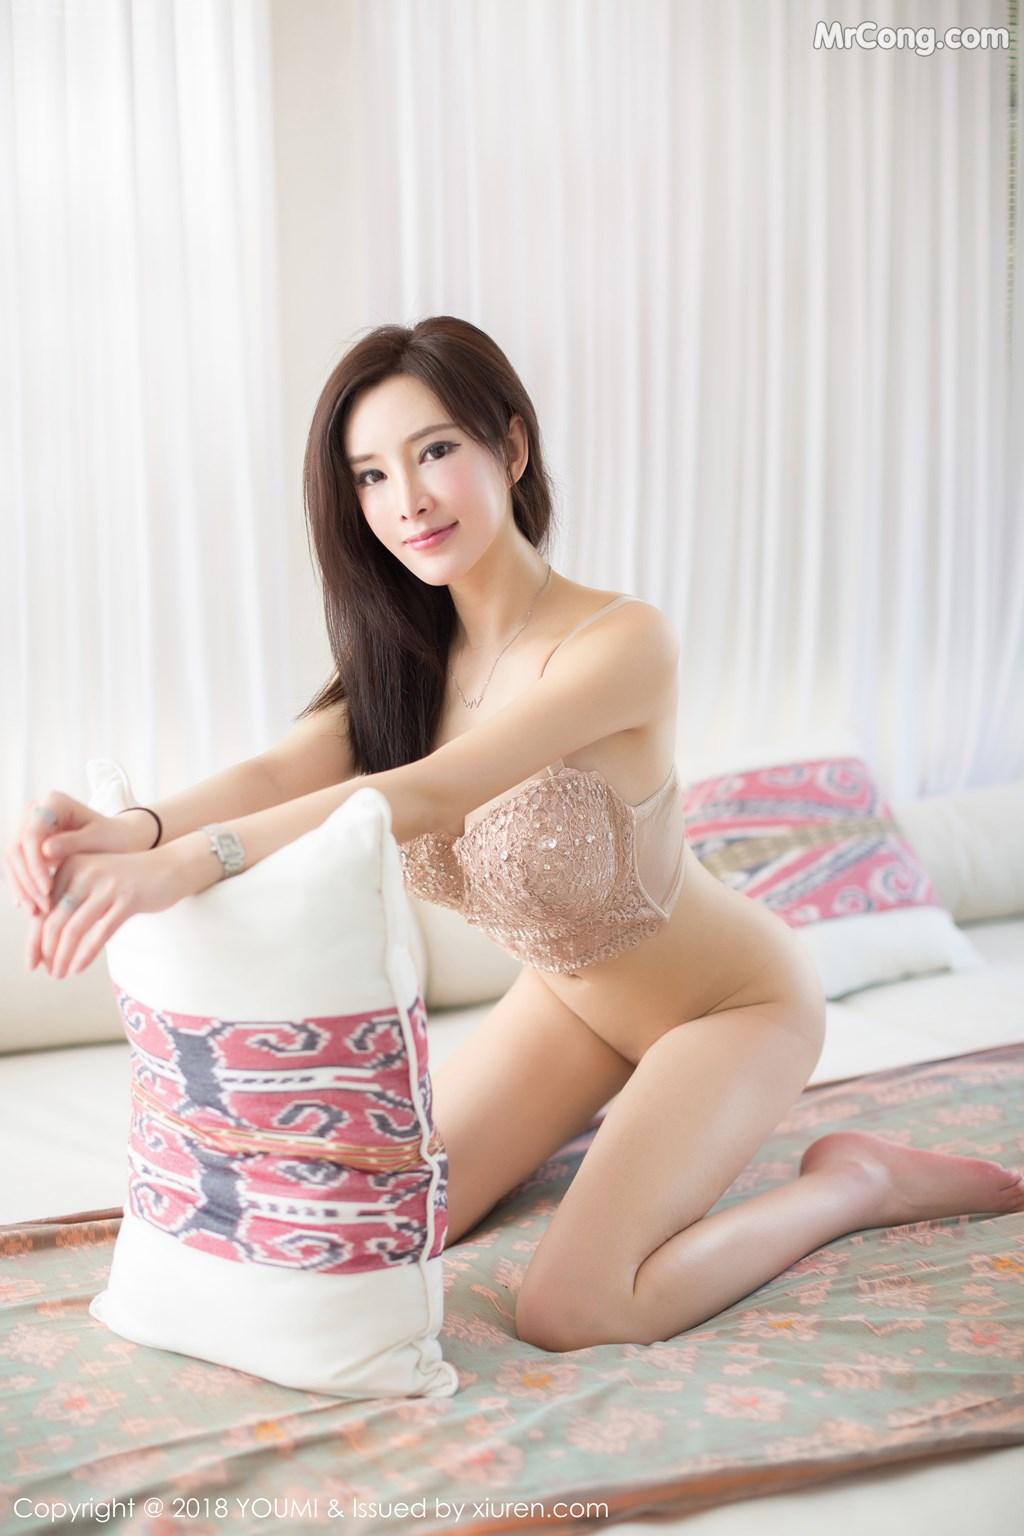 Image YouMi-Vol.197-Tu-Fei-Yuan-Ai-Cuo-Qiong-MrCong.com-001 in post YouMi Vol.197: Người mẫu 奶瓶土肥圆 (48 ảnh)